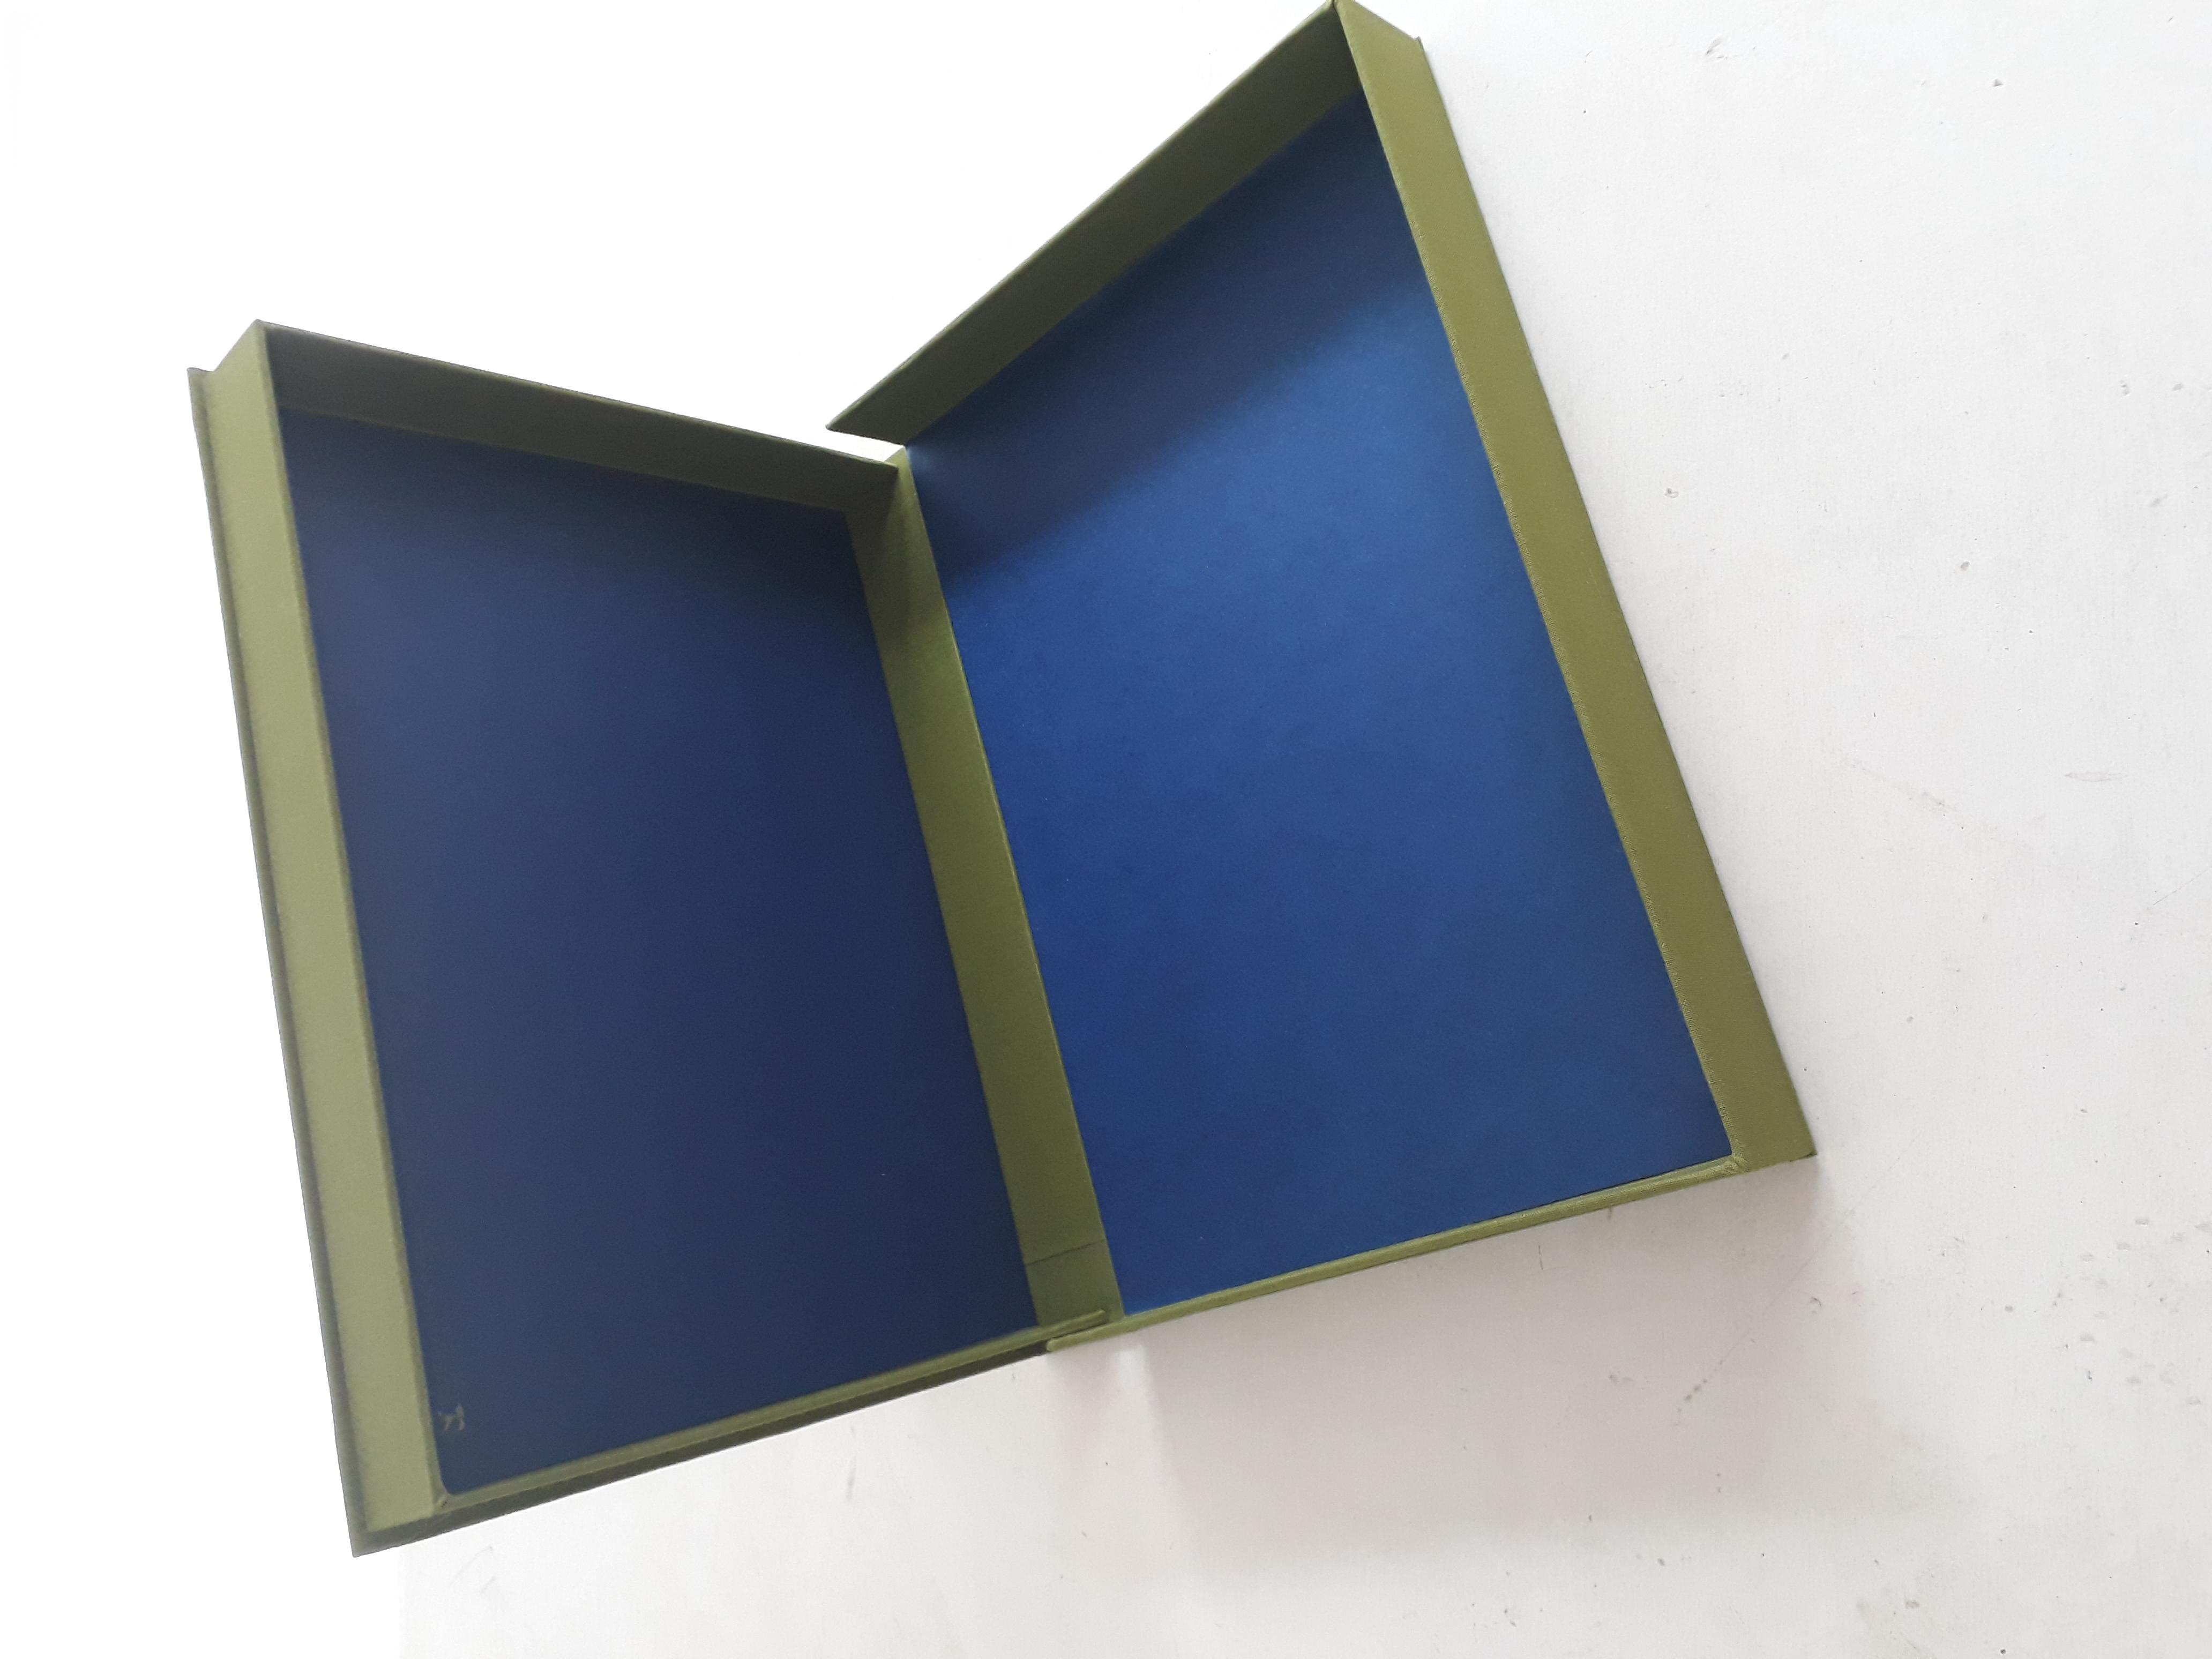 Doos groen blauw, Yvette Lardinois